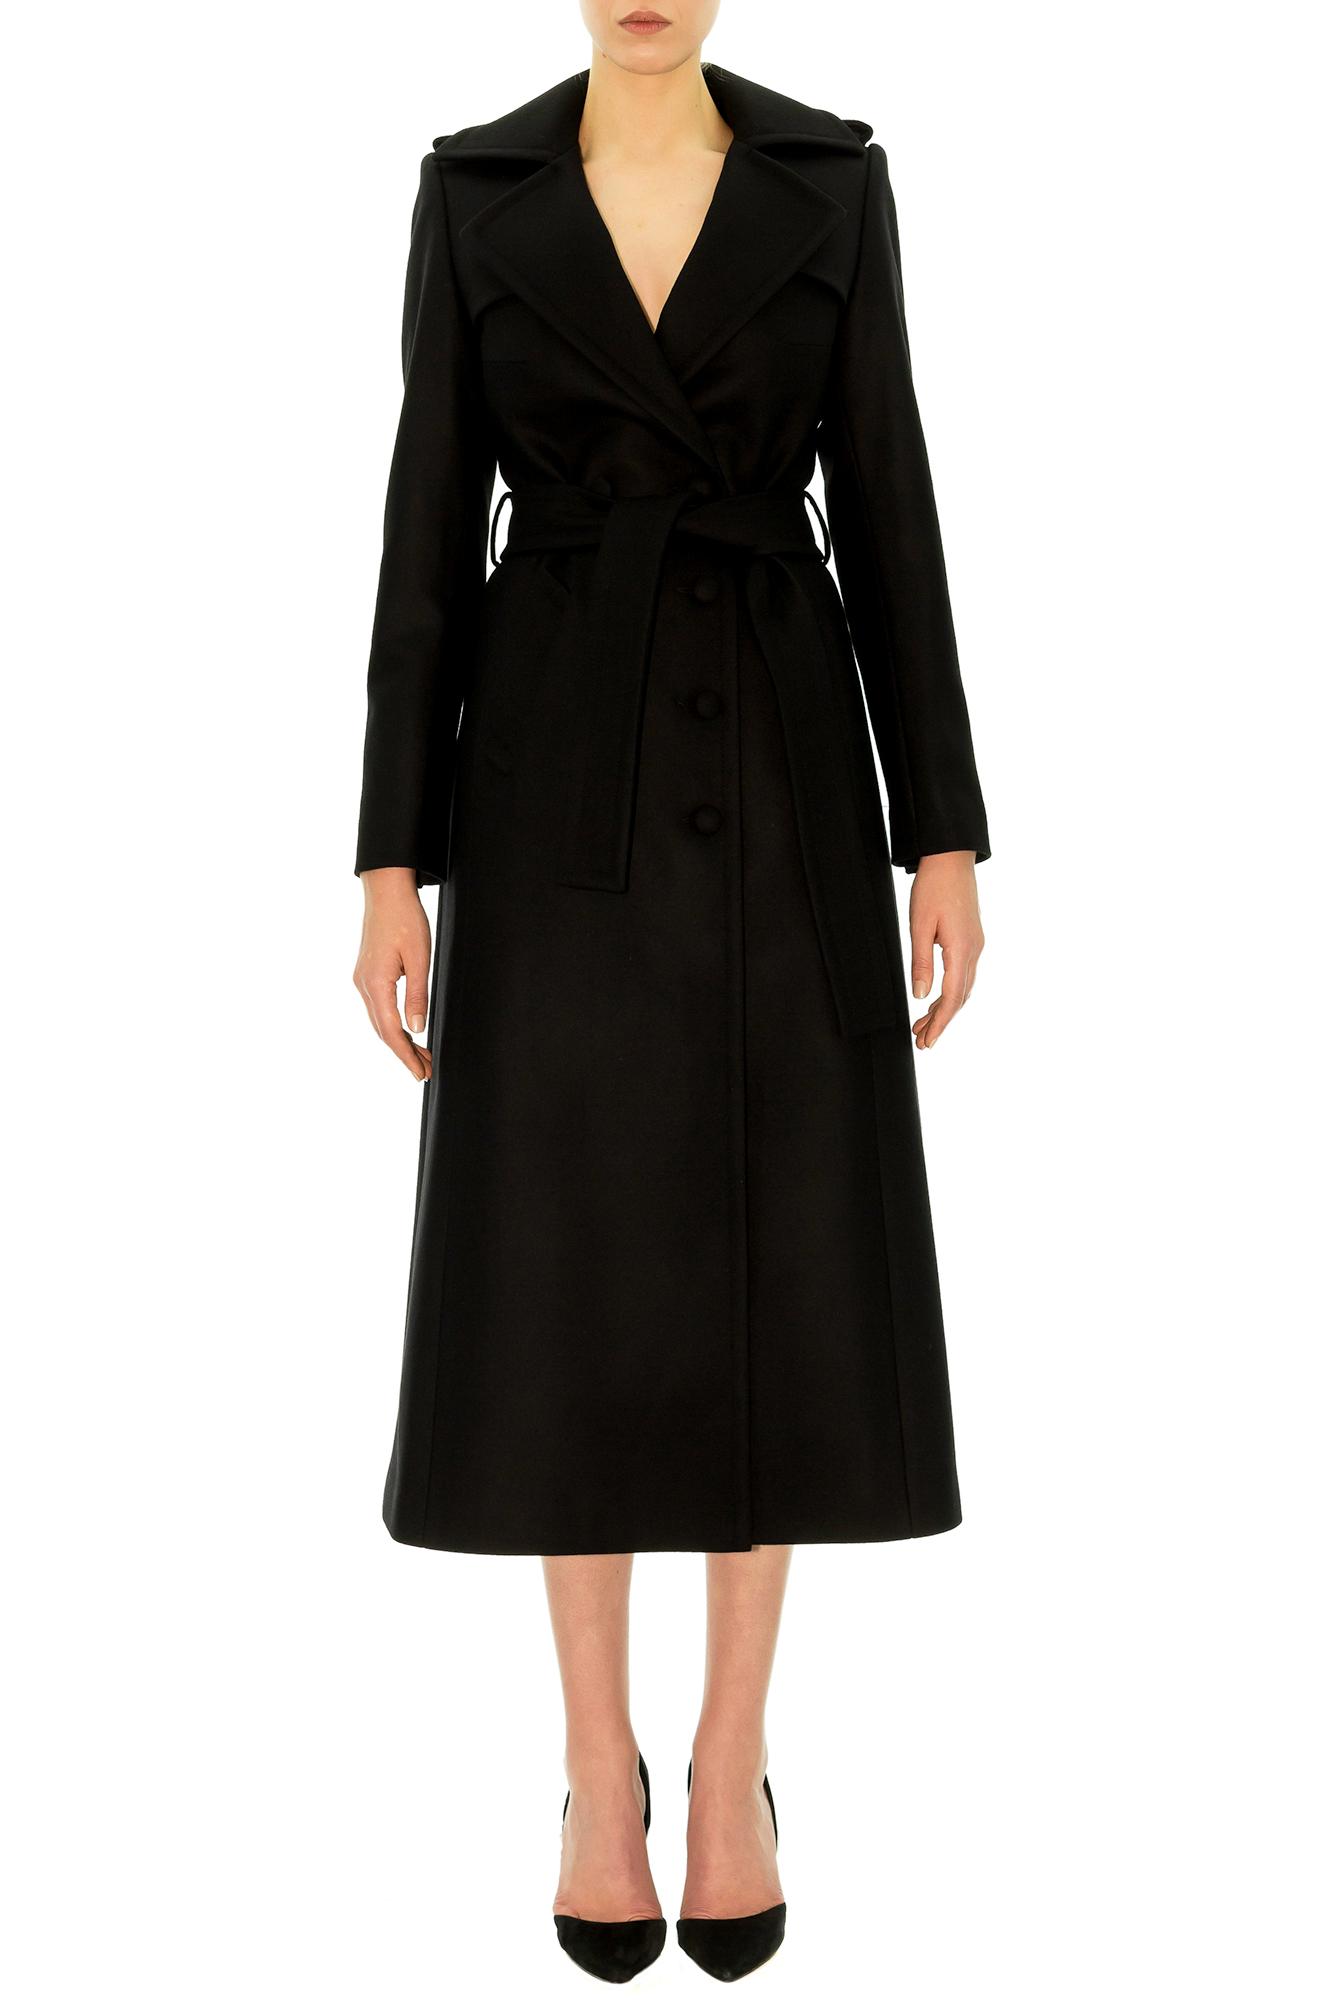 manteau cachemire manteau noir manteau long manteau femme alexandrina turcan stefanie renoma. Black Bedroom Furniture Sets. Home Design Ideas